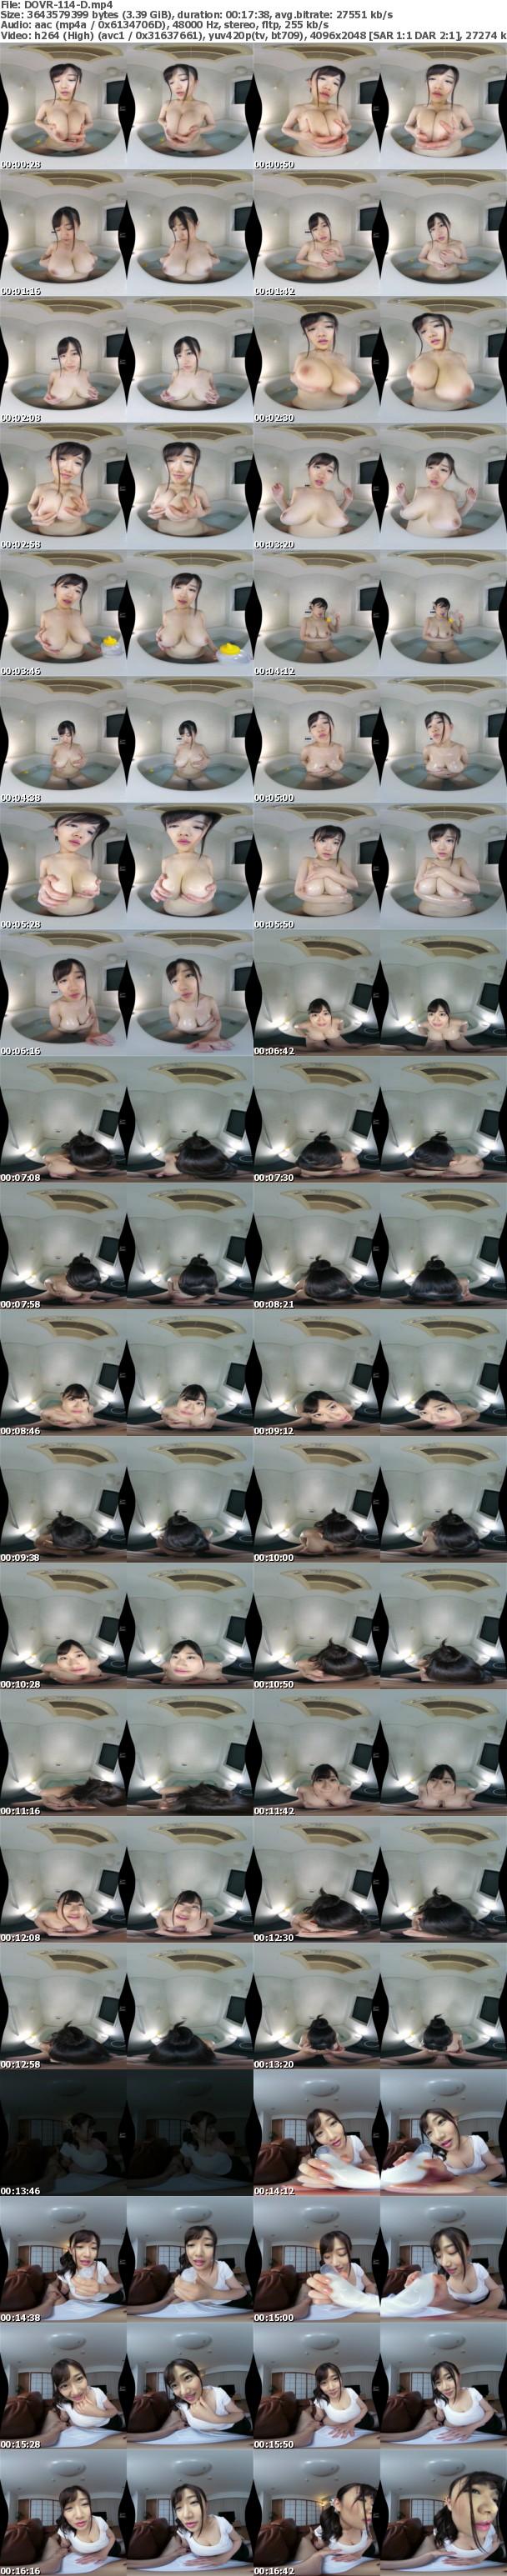 (VR) DOVR-114 【まとめ買い特典あり】高精細VR×バイノーラル 家事代行サービスを頼んだら爆乳家政婦がやってきた!小梅えな 完全版